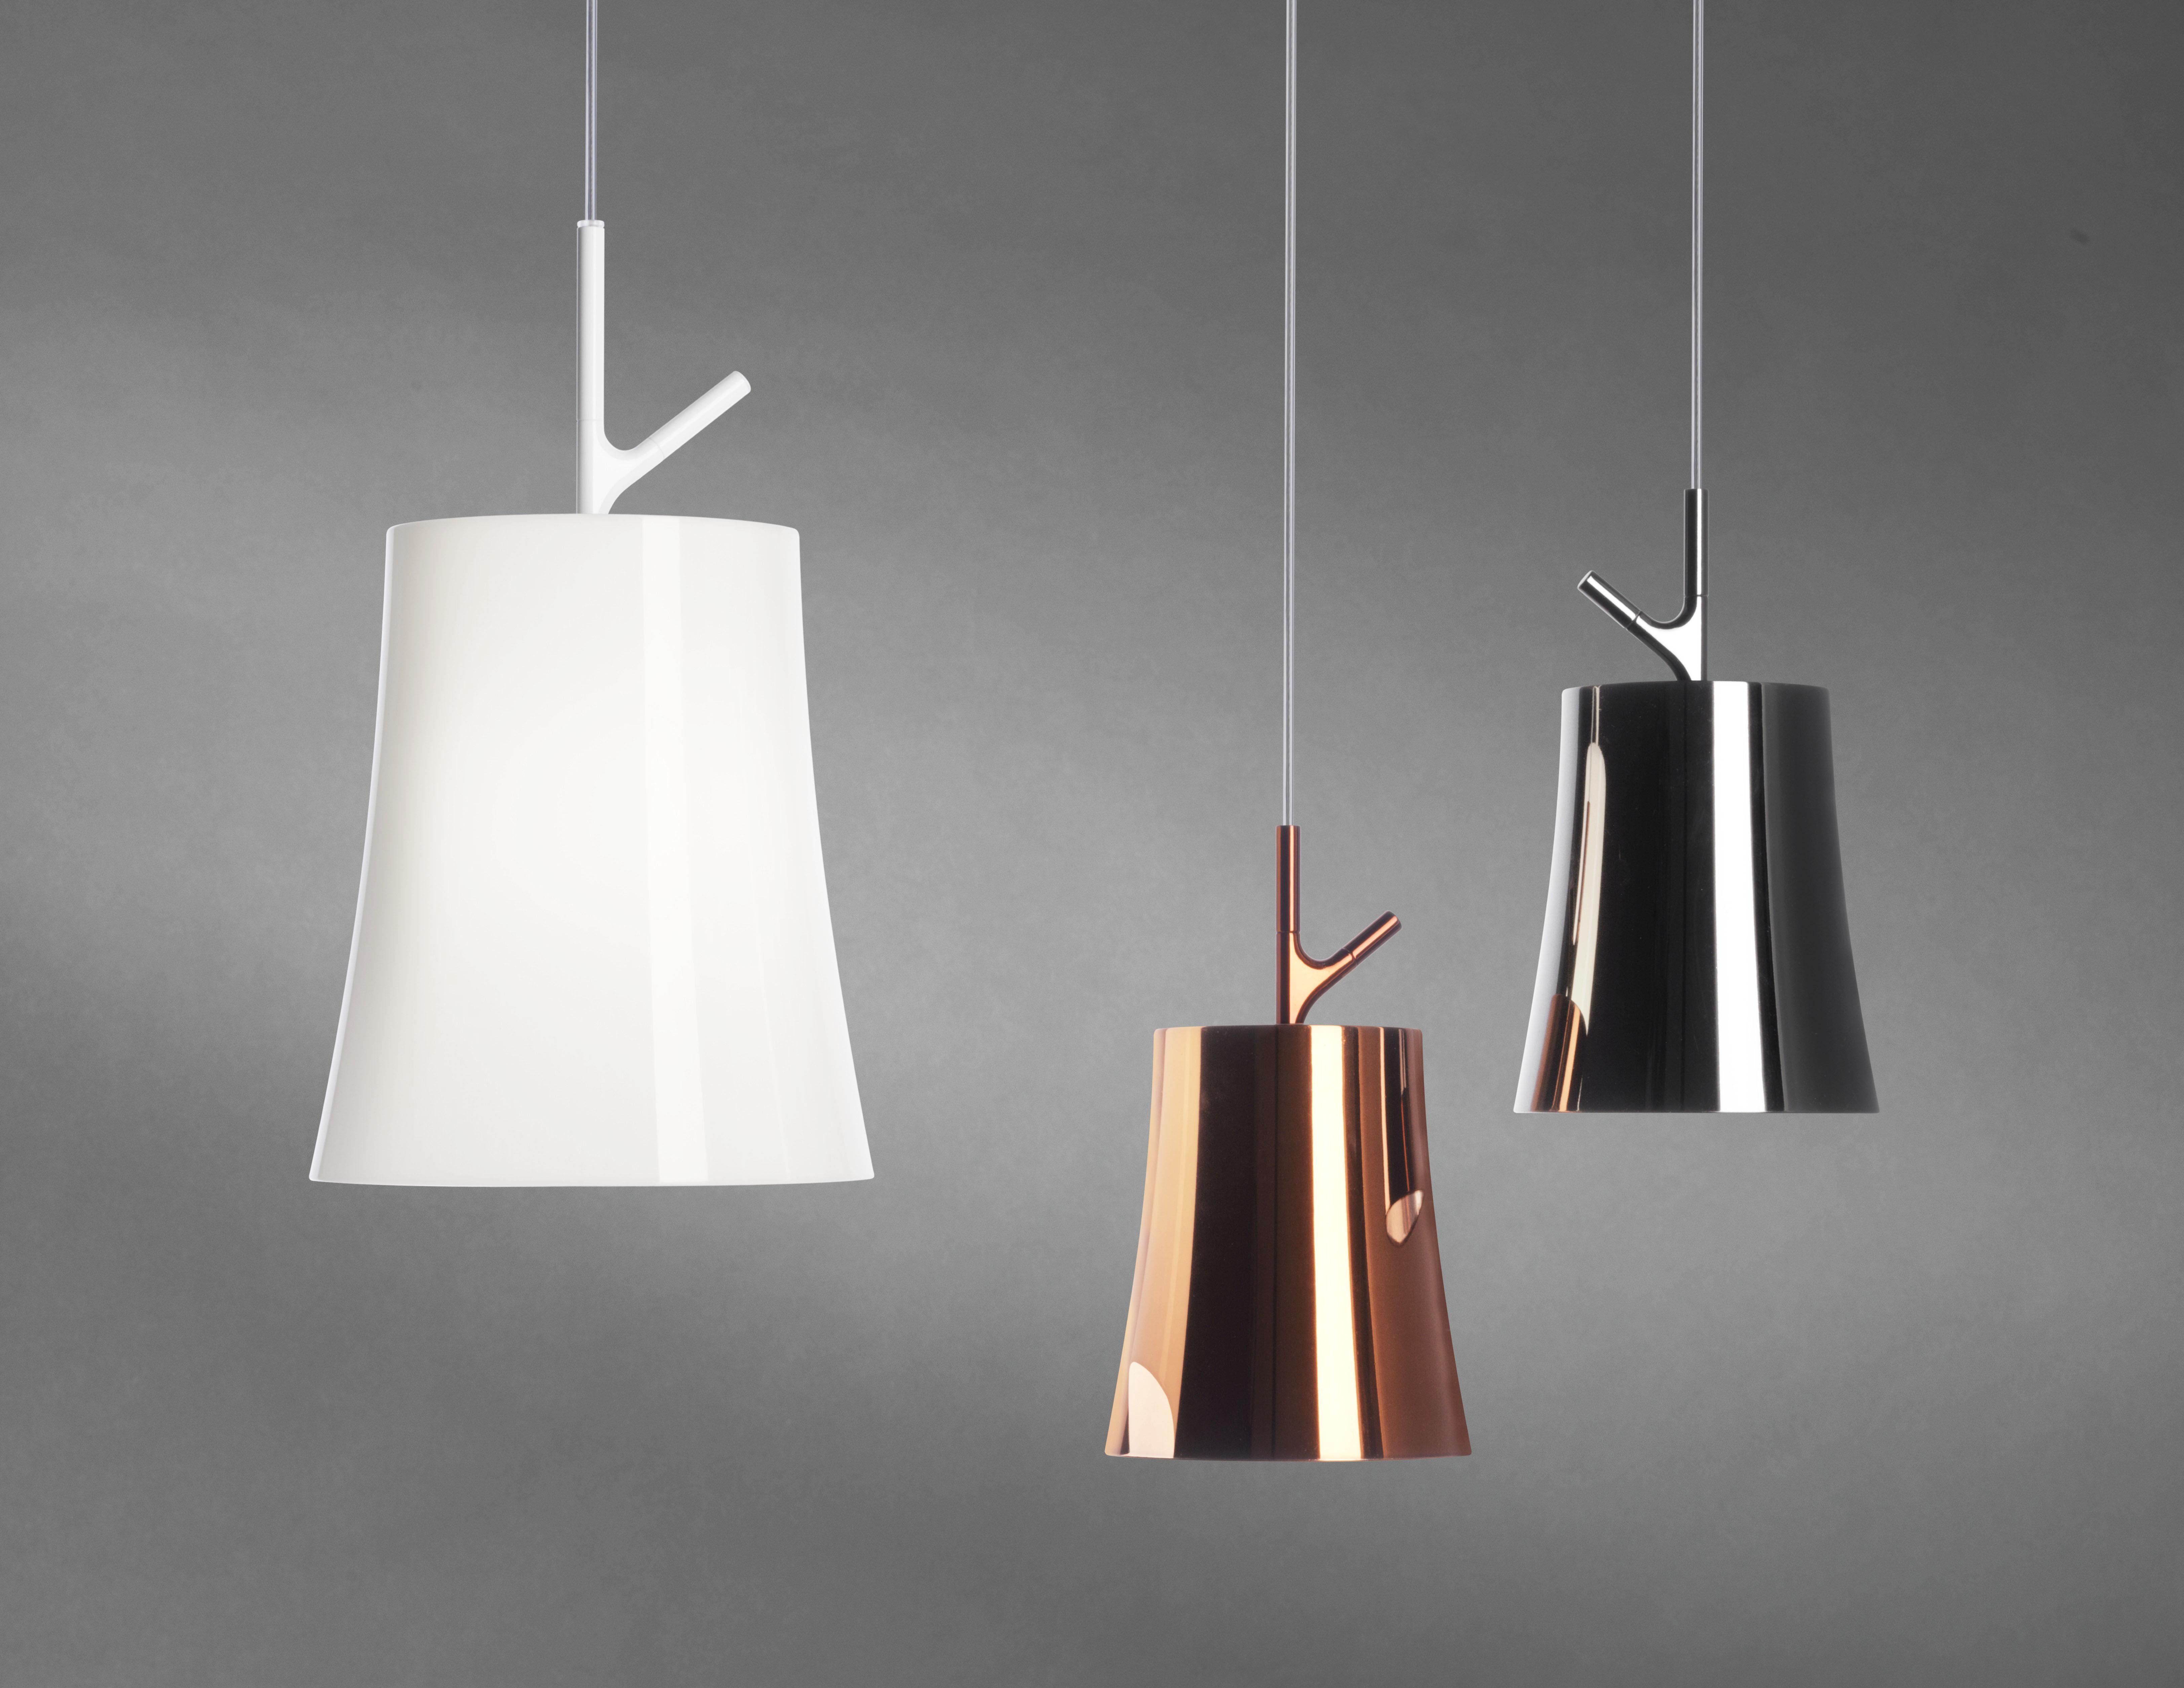 suspension birdie piccola 17 cm cuivre foscarini. Black Bedroom Furniture Sets. Home Design Ideas